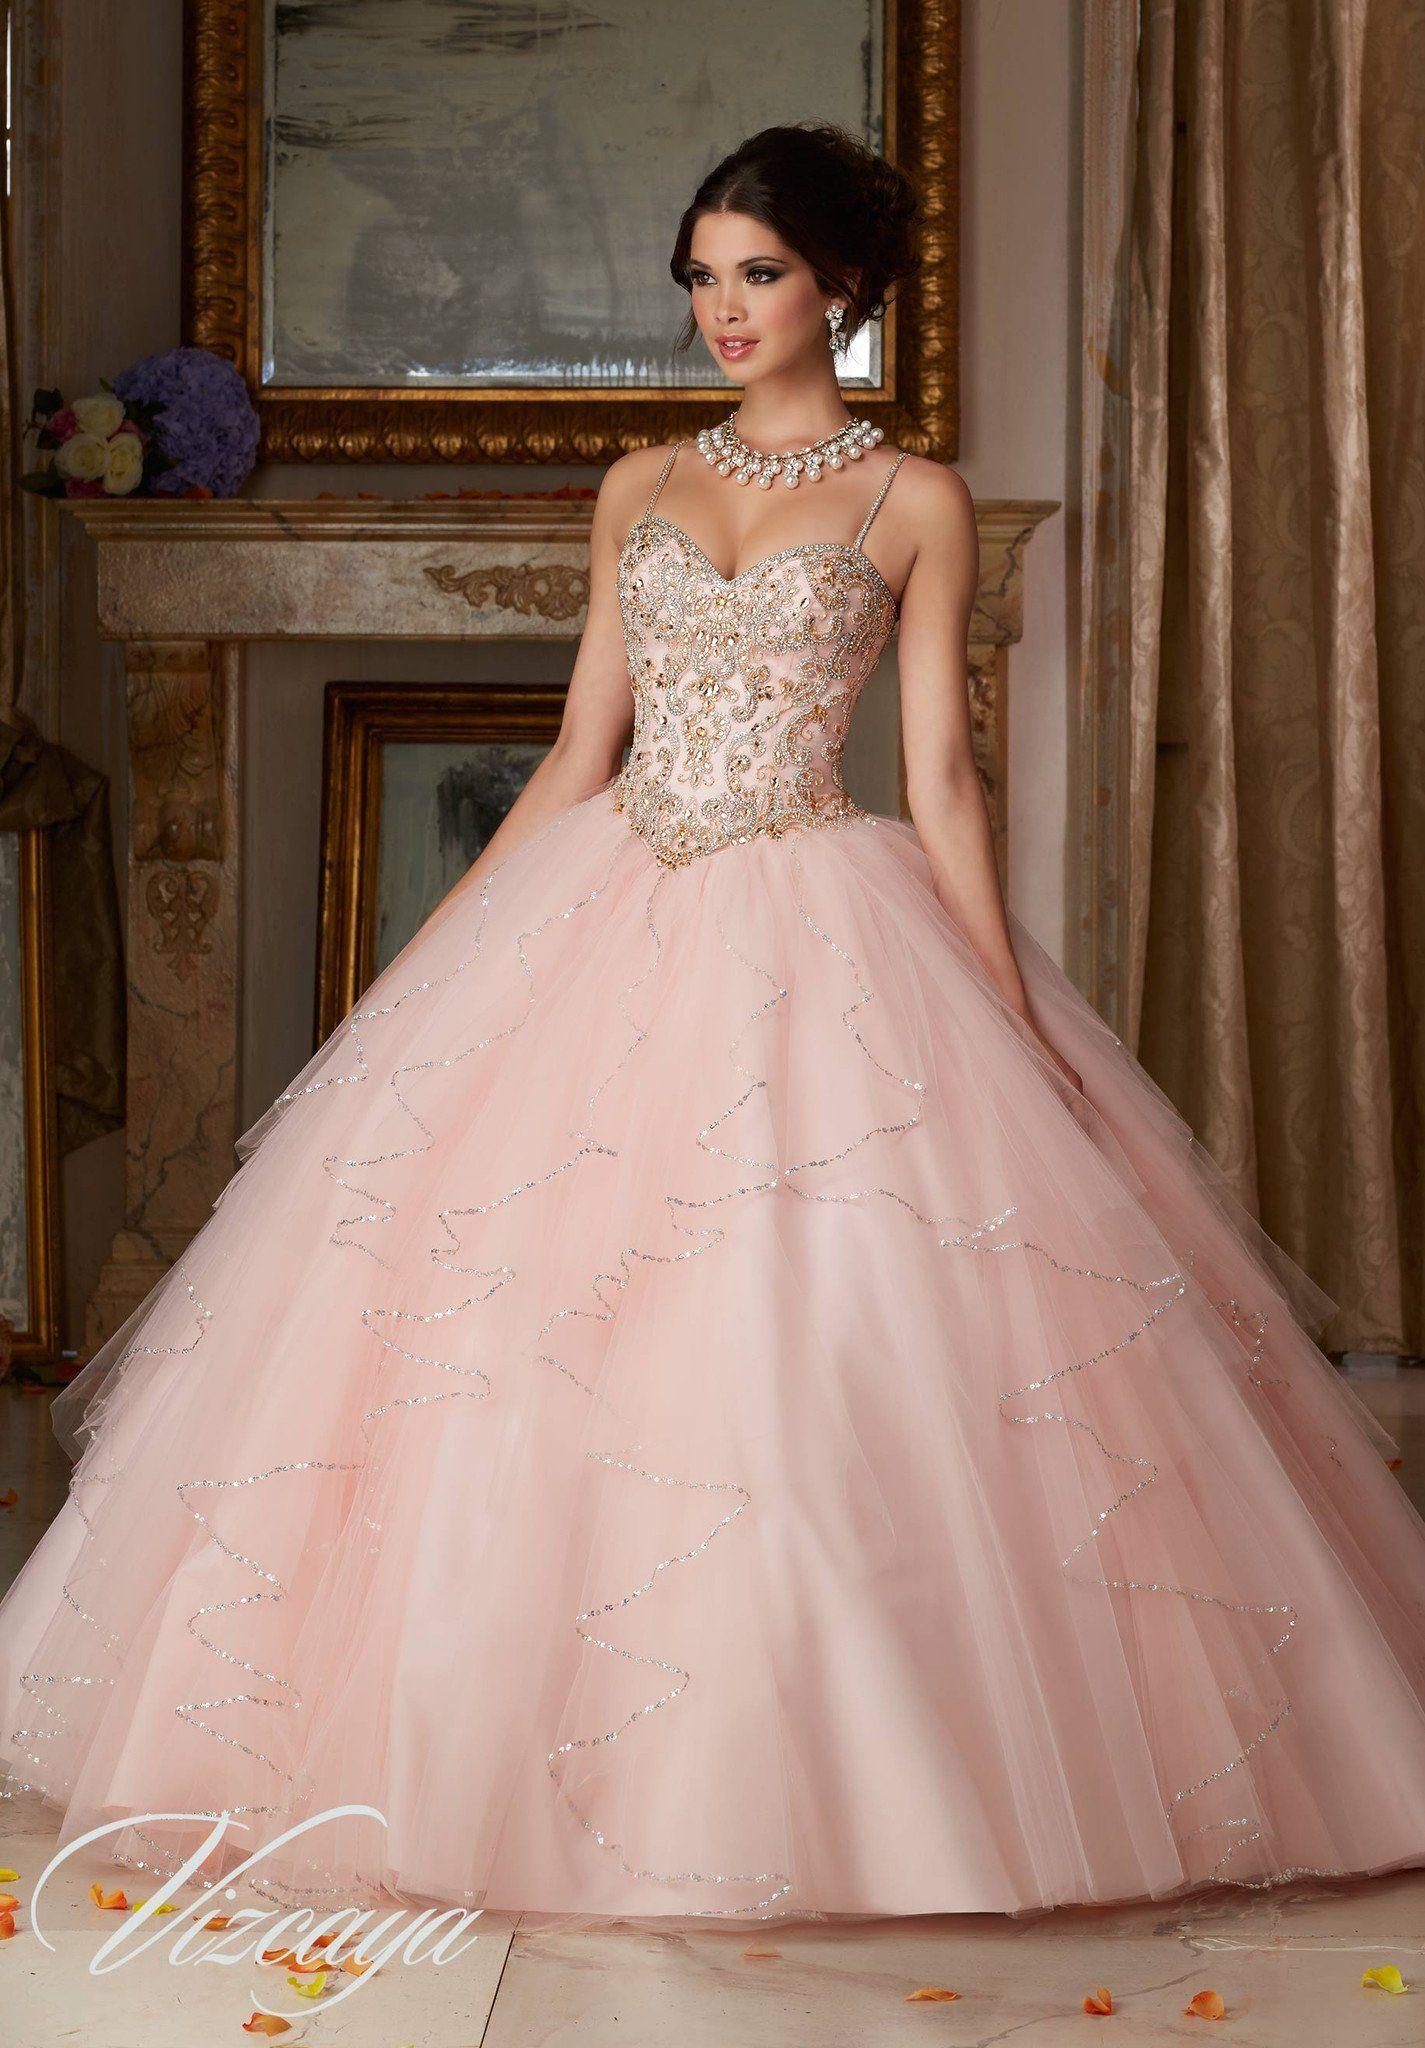 Vizcaya By Mori Lee 89101 Quinceanera Dress In 2021 Mori Lee Quinceanera Dresses Quinceanera Dresses Pink Quinceanera Dresses [ 2048 x 1425 Pixel ]